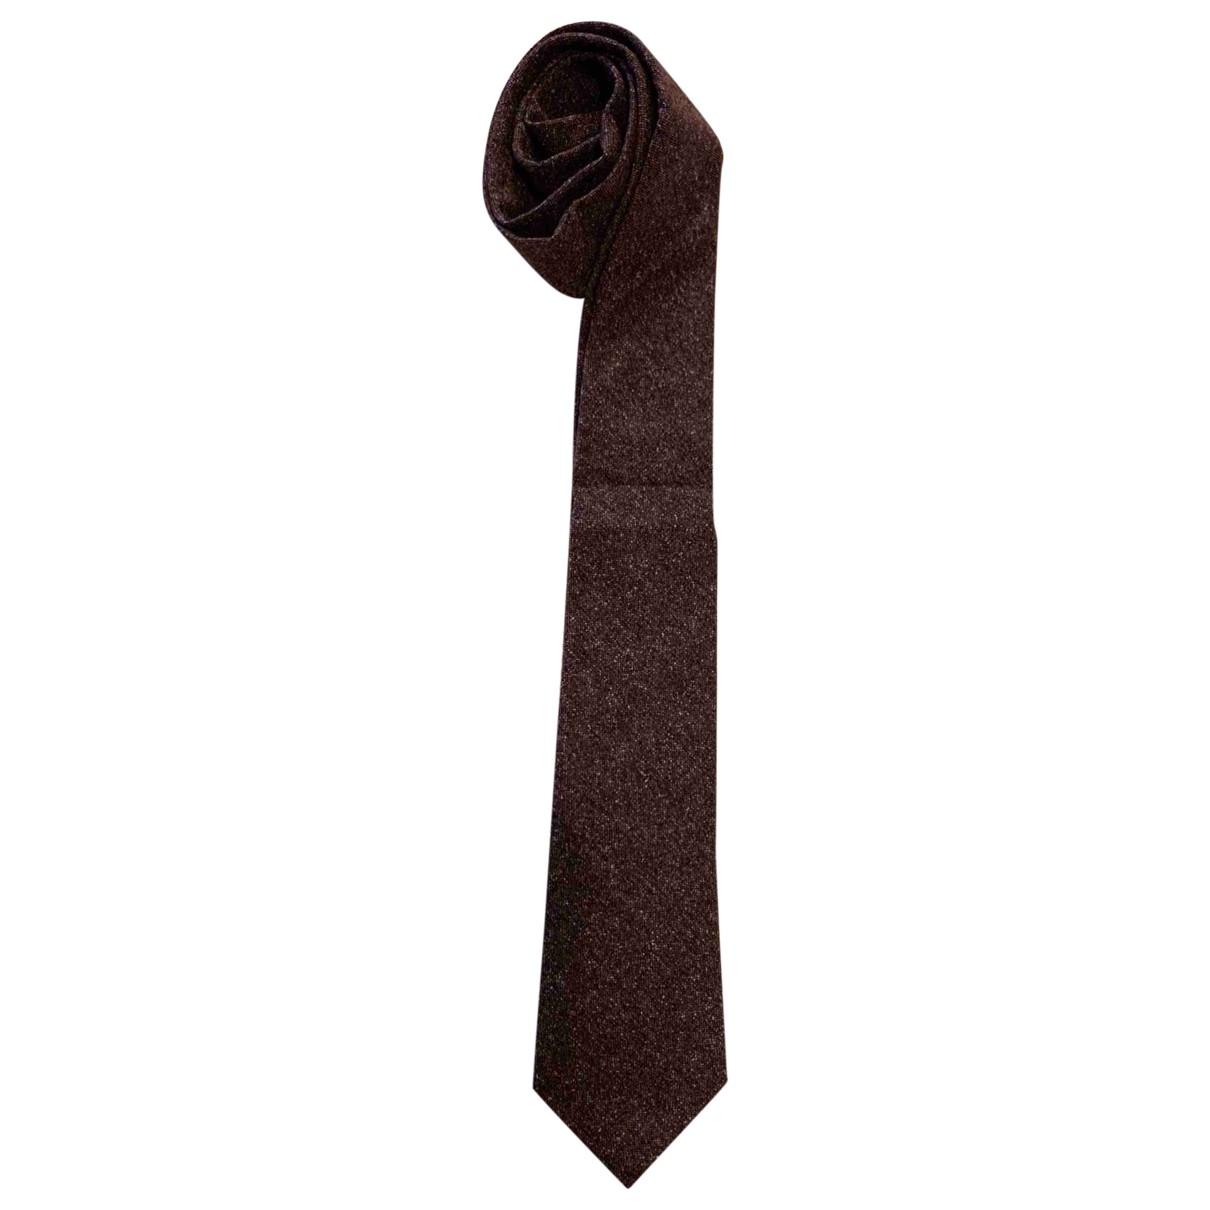 Brunello Cucinelli \N Burgundy Cashmere Ties for Men \N